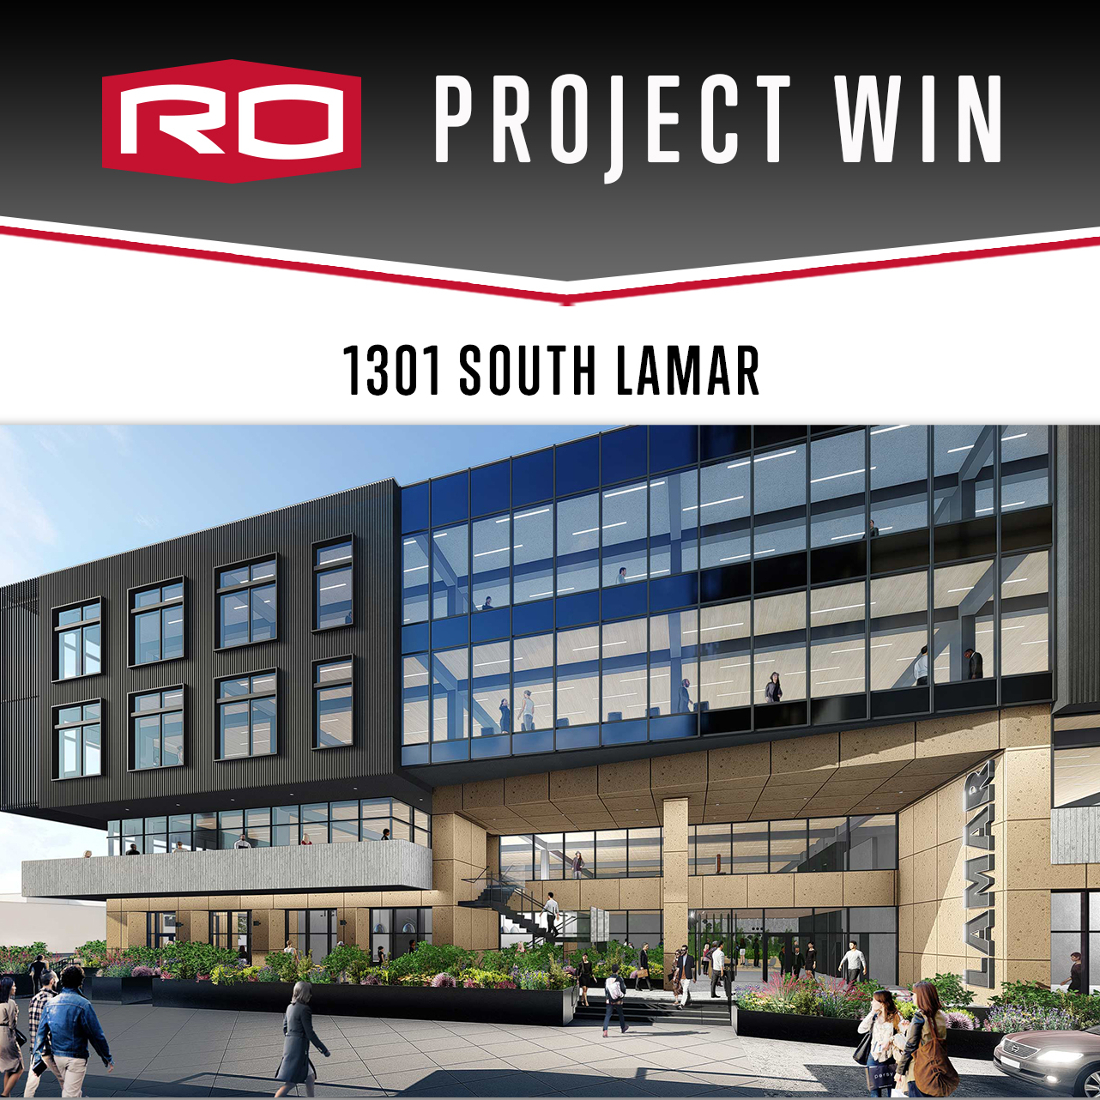 PROJECT WIN: 1301 SOUTH LAMAR